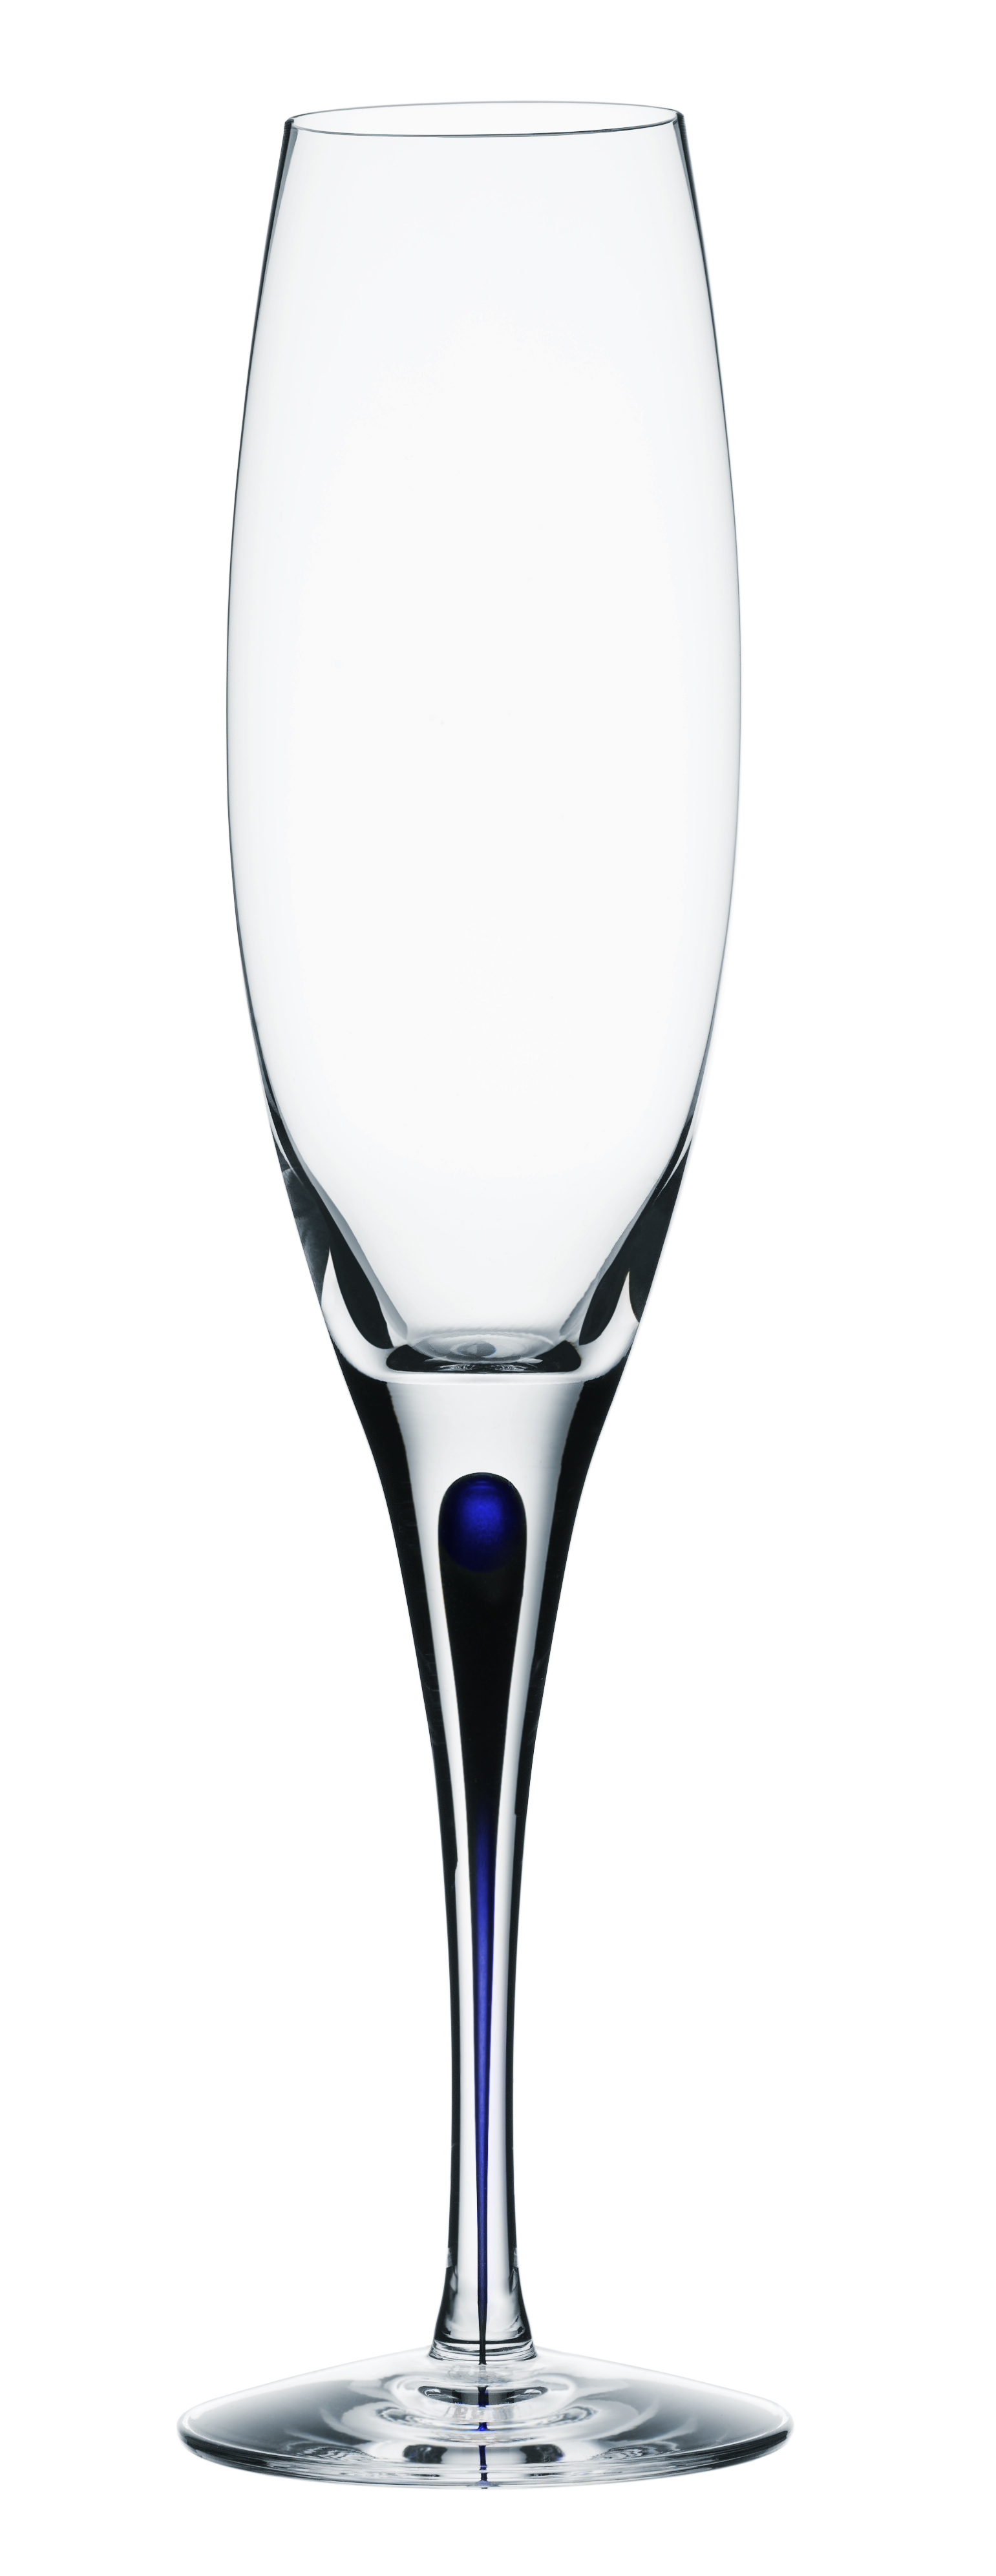 Orrefors Intermezzo Blå Champagne 26 cl